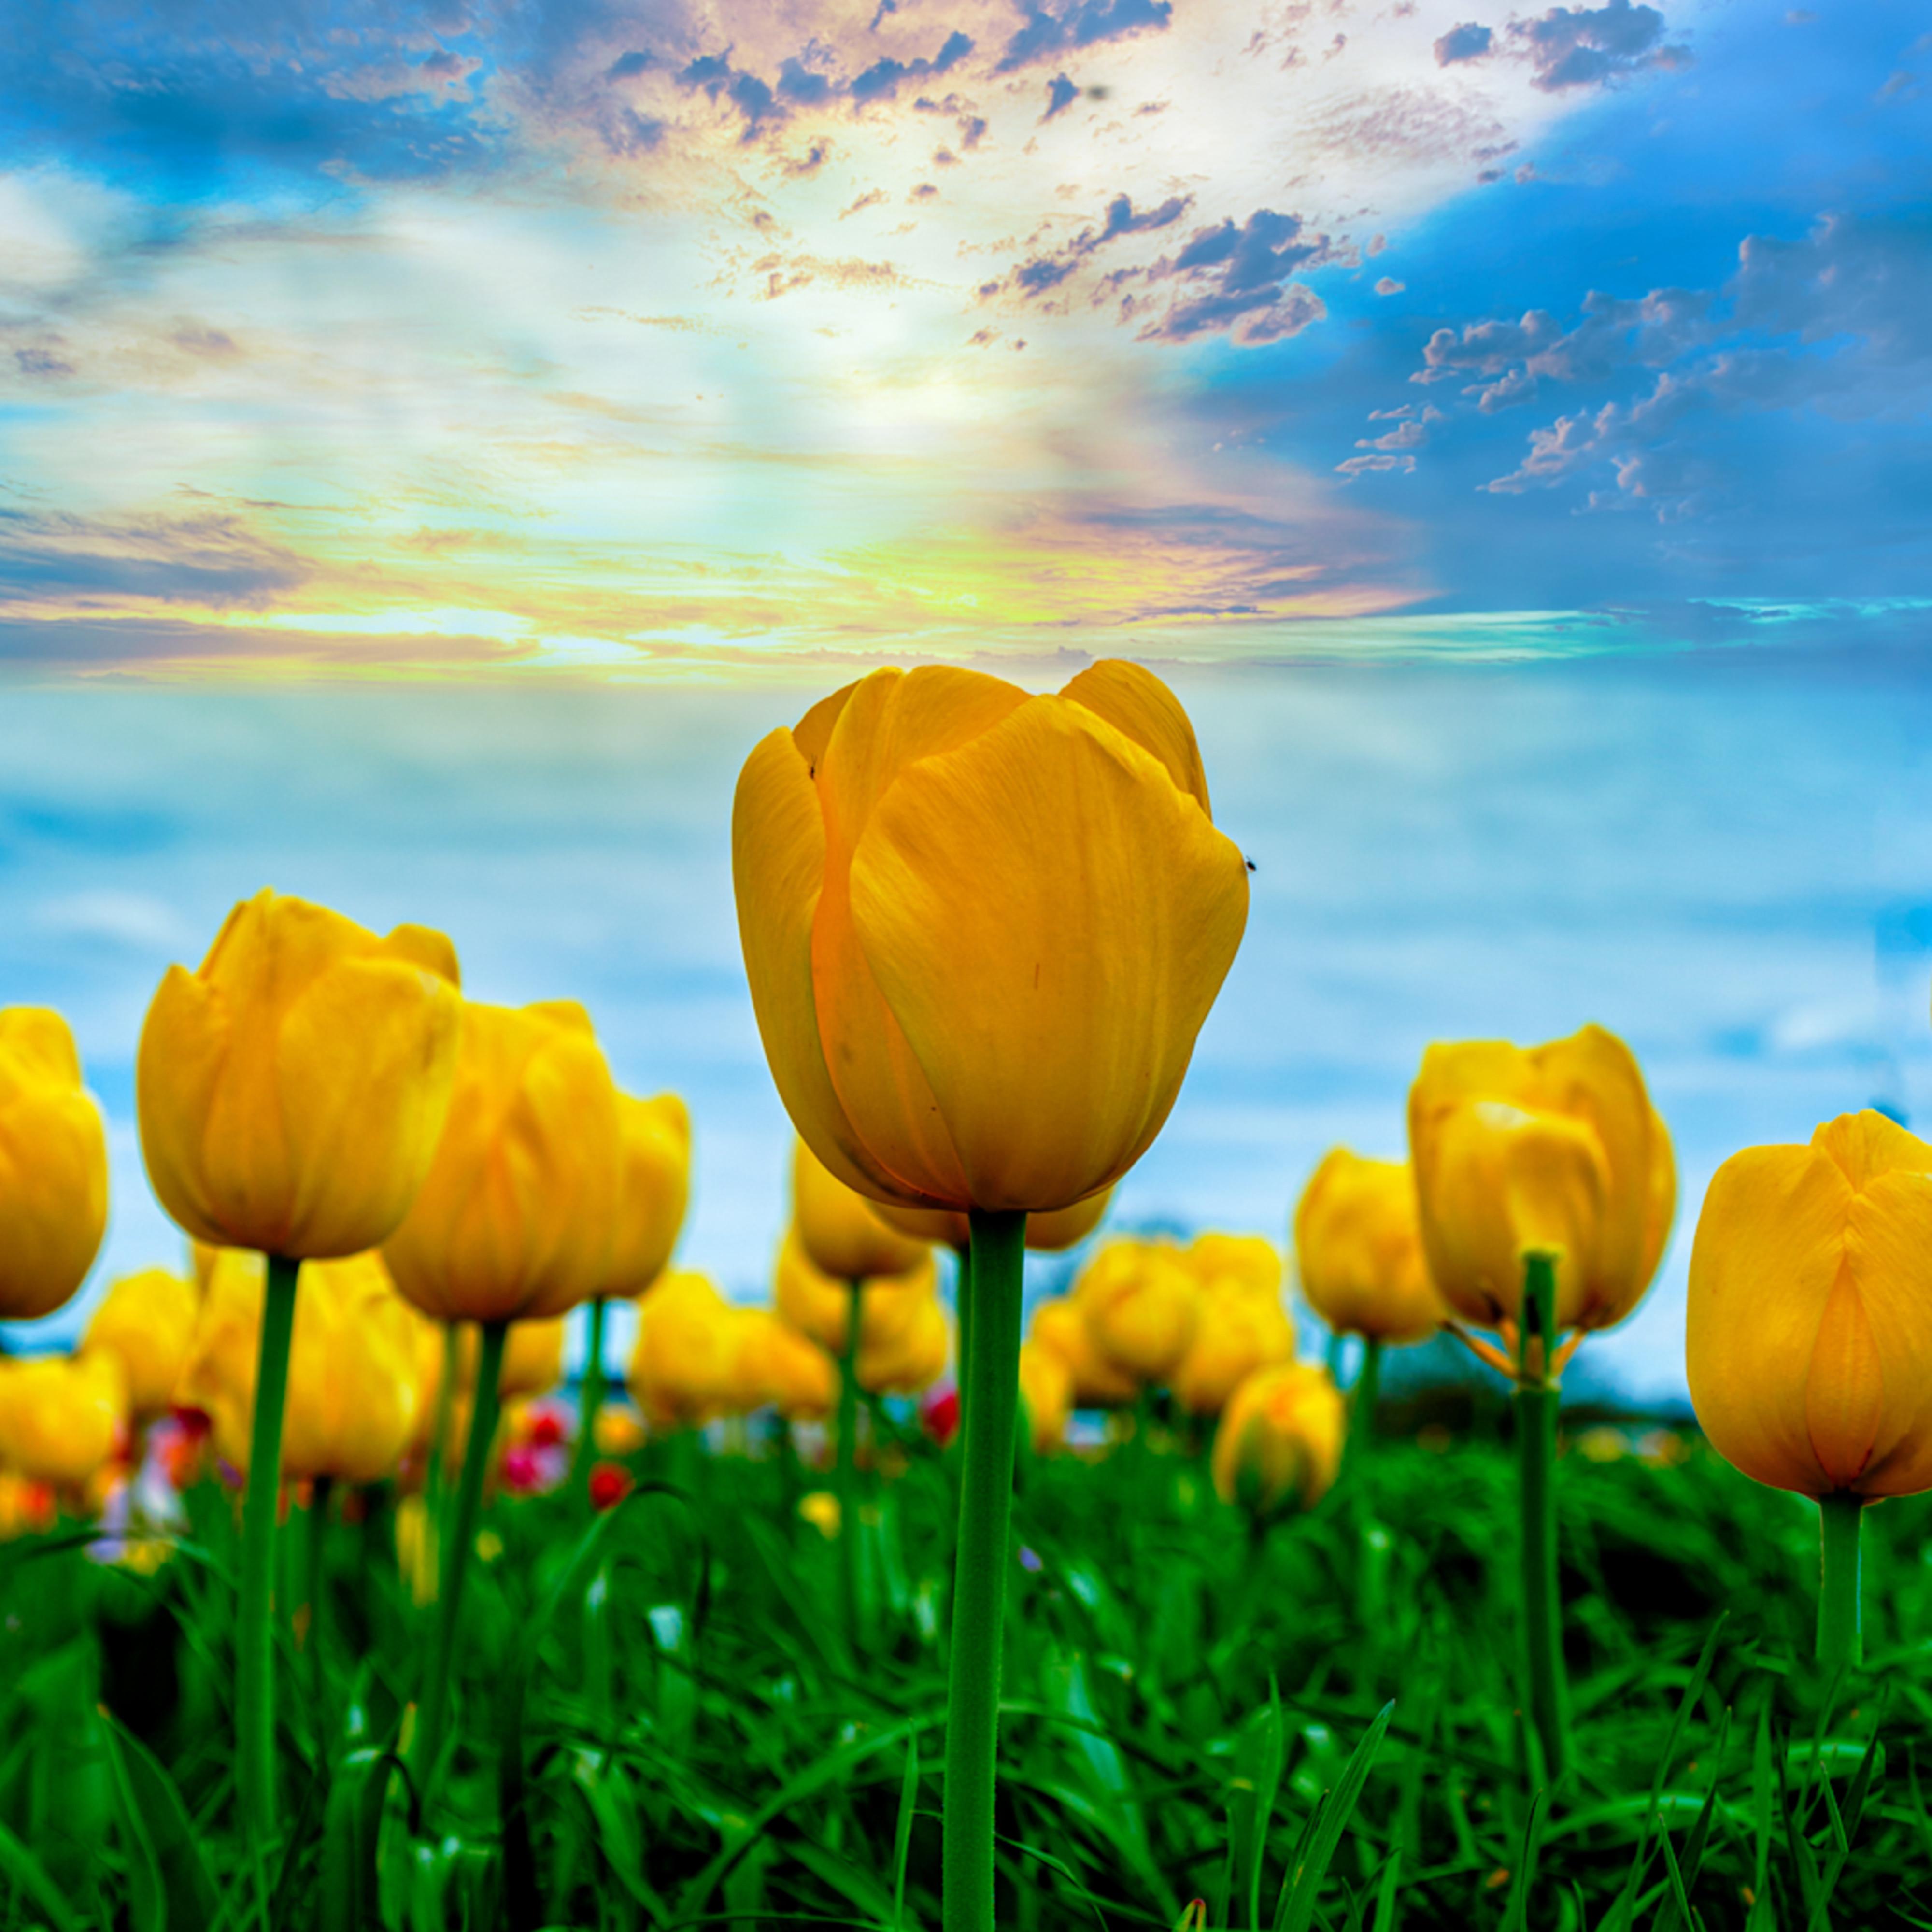 Tulips 2 x4c3hm